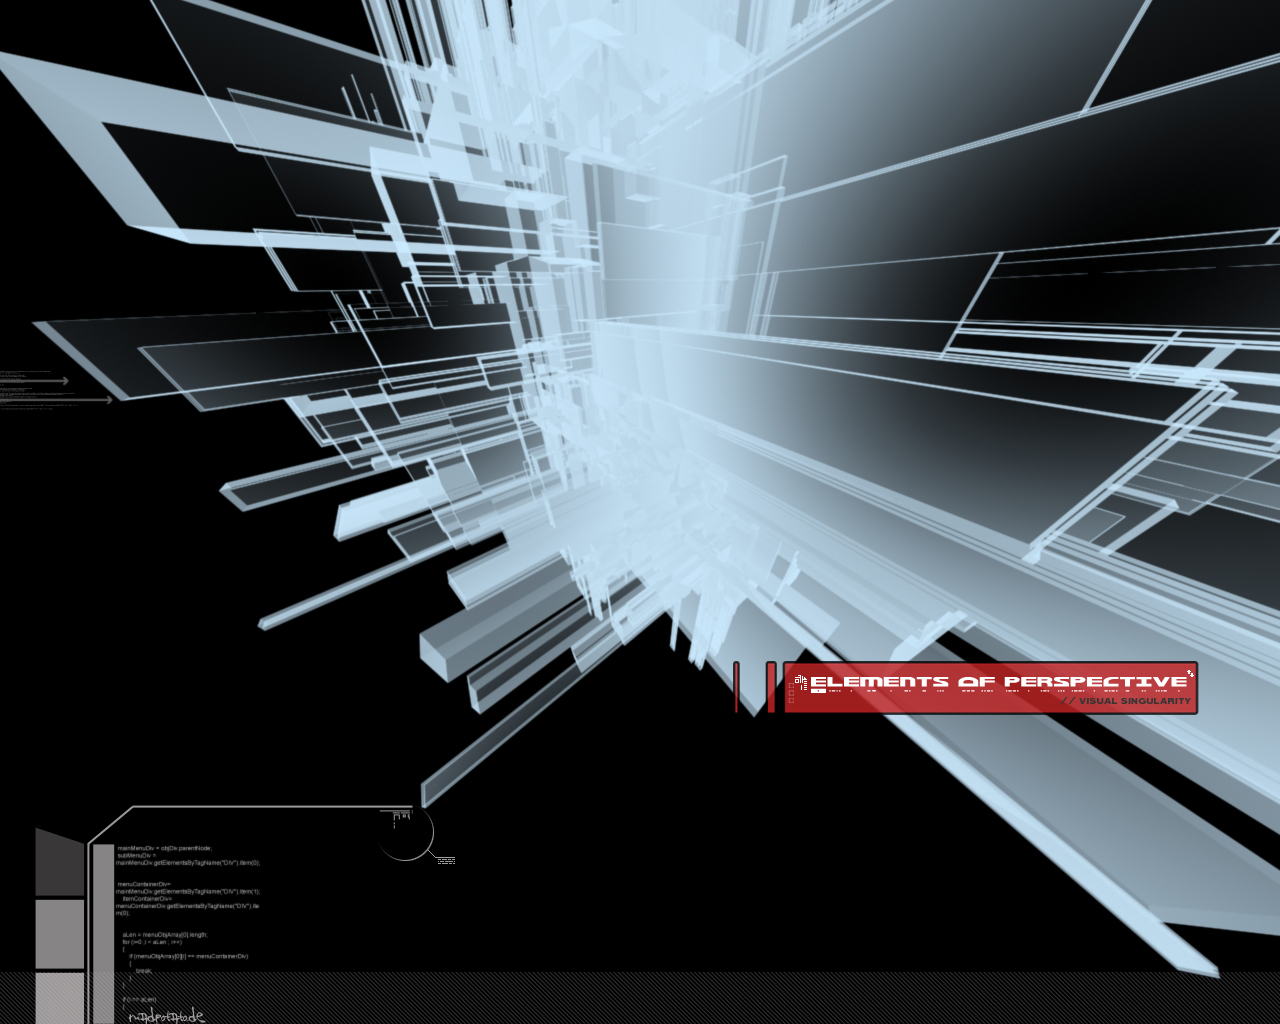 http://4.bp.blogspot.com/-mIMSSD9qvIU/TkEkvQZk1jI/AAAAAAAAAOo/ViljE2vt4mM/s1600/Elements_Of_Perspective.jpg